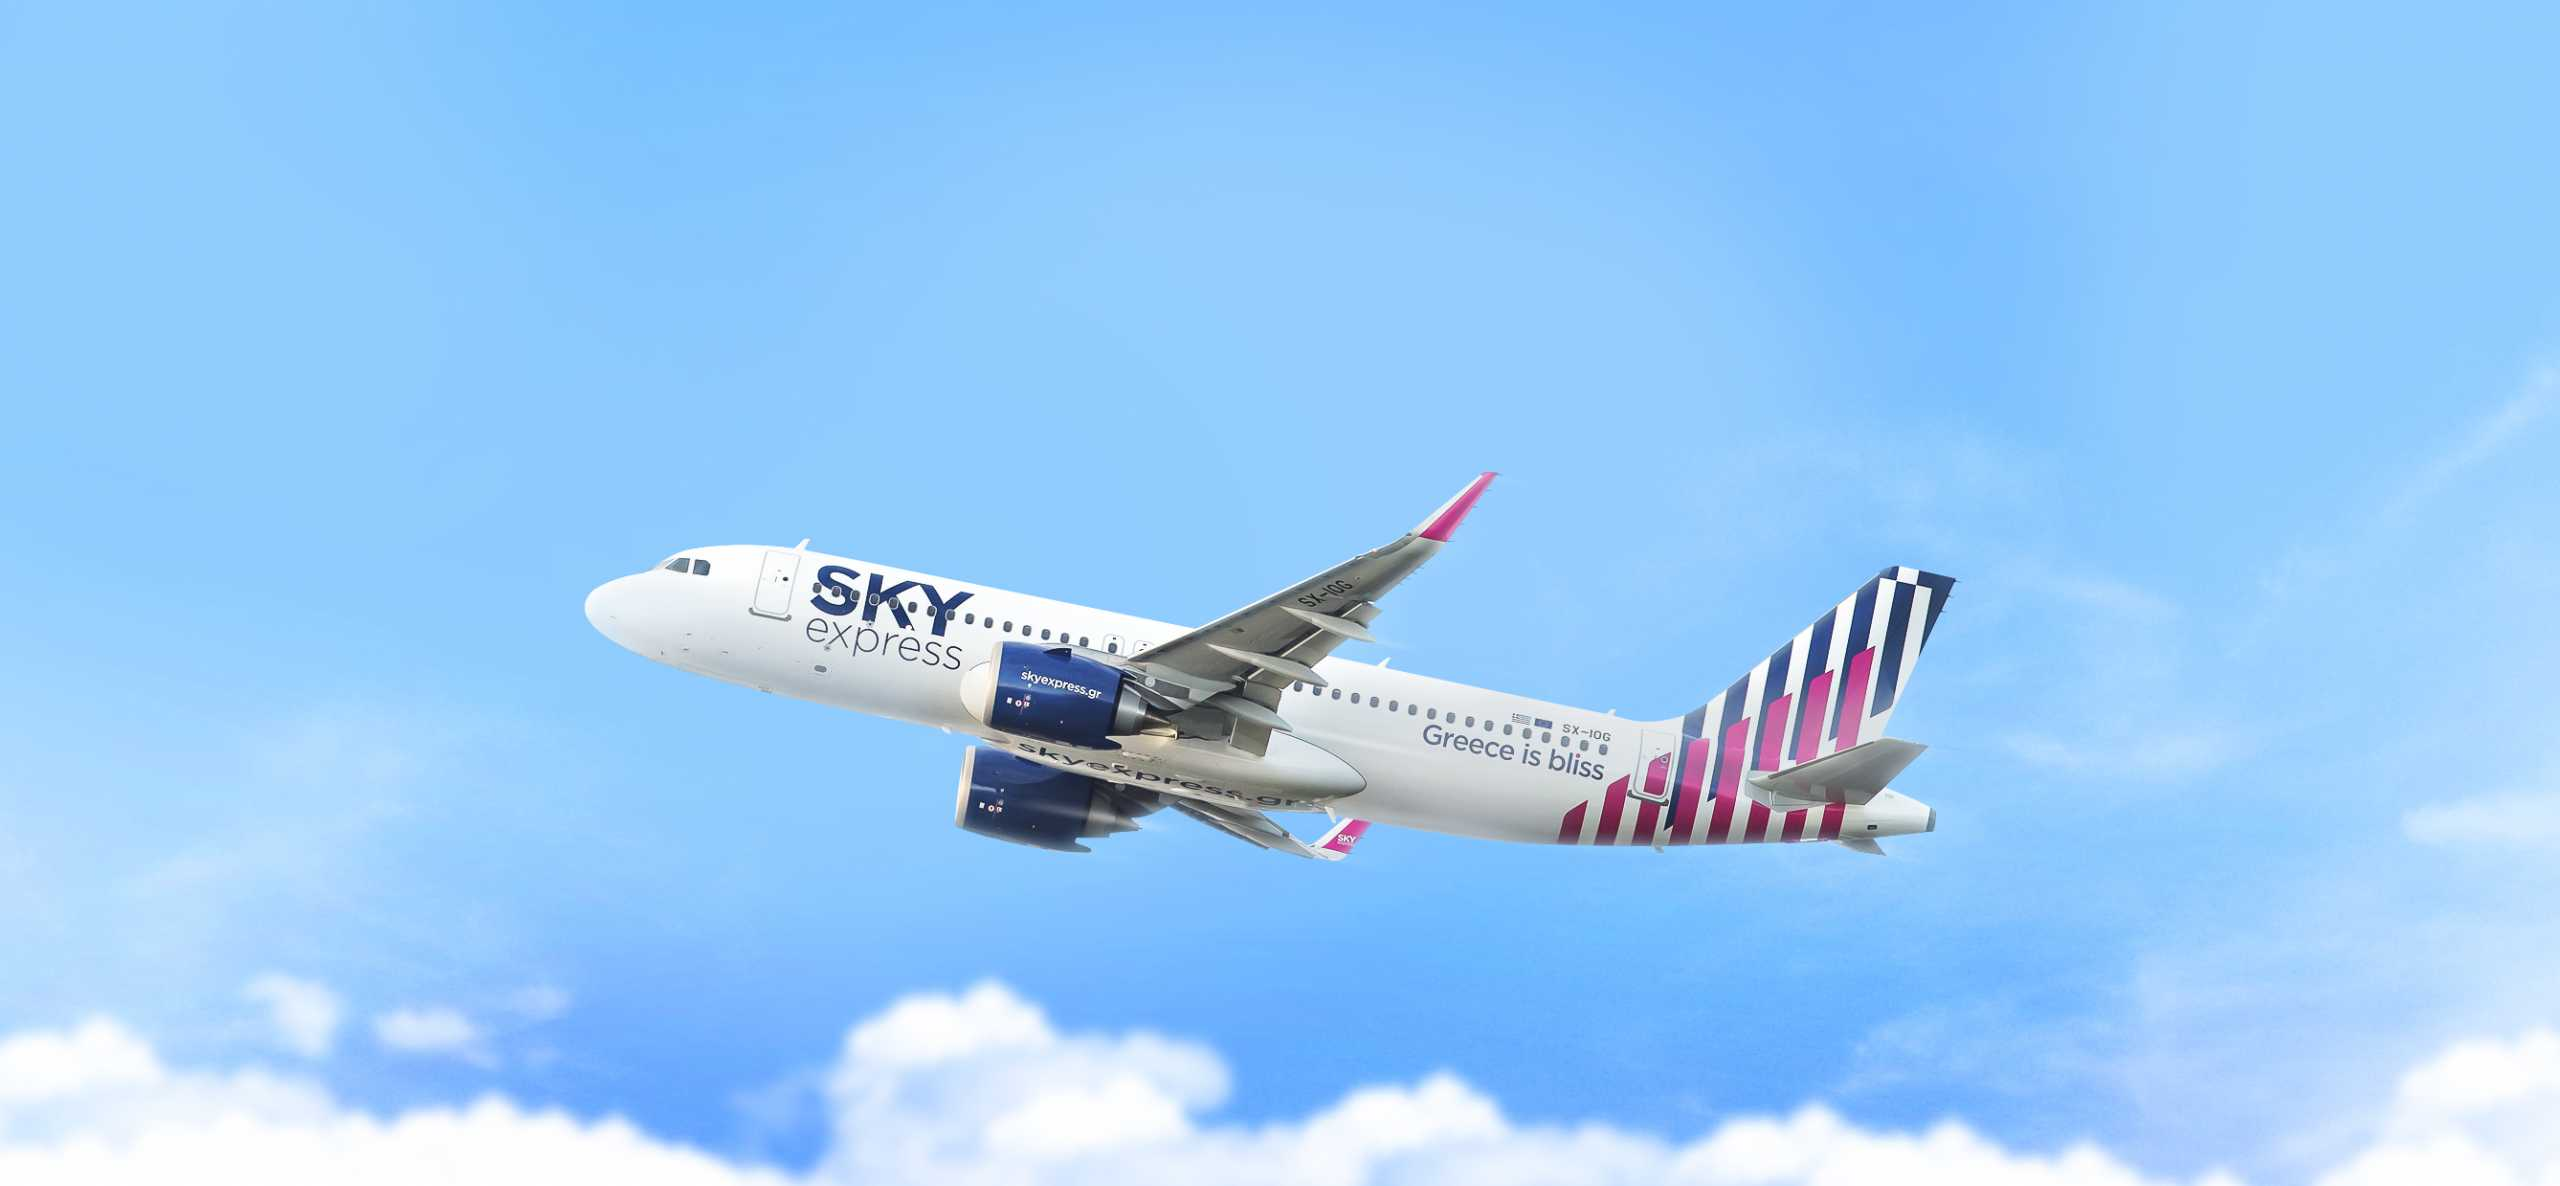 SKY express: Με Κύπρο ξεκινά το πρόγραμμα απευθείας πτήσεων Θεσσαλονίκης με αεροδρόμια του εξωτερικού